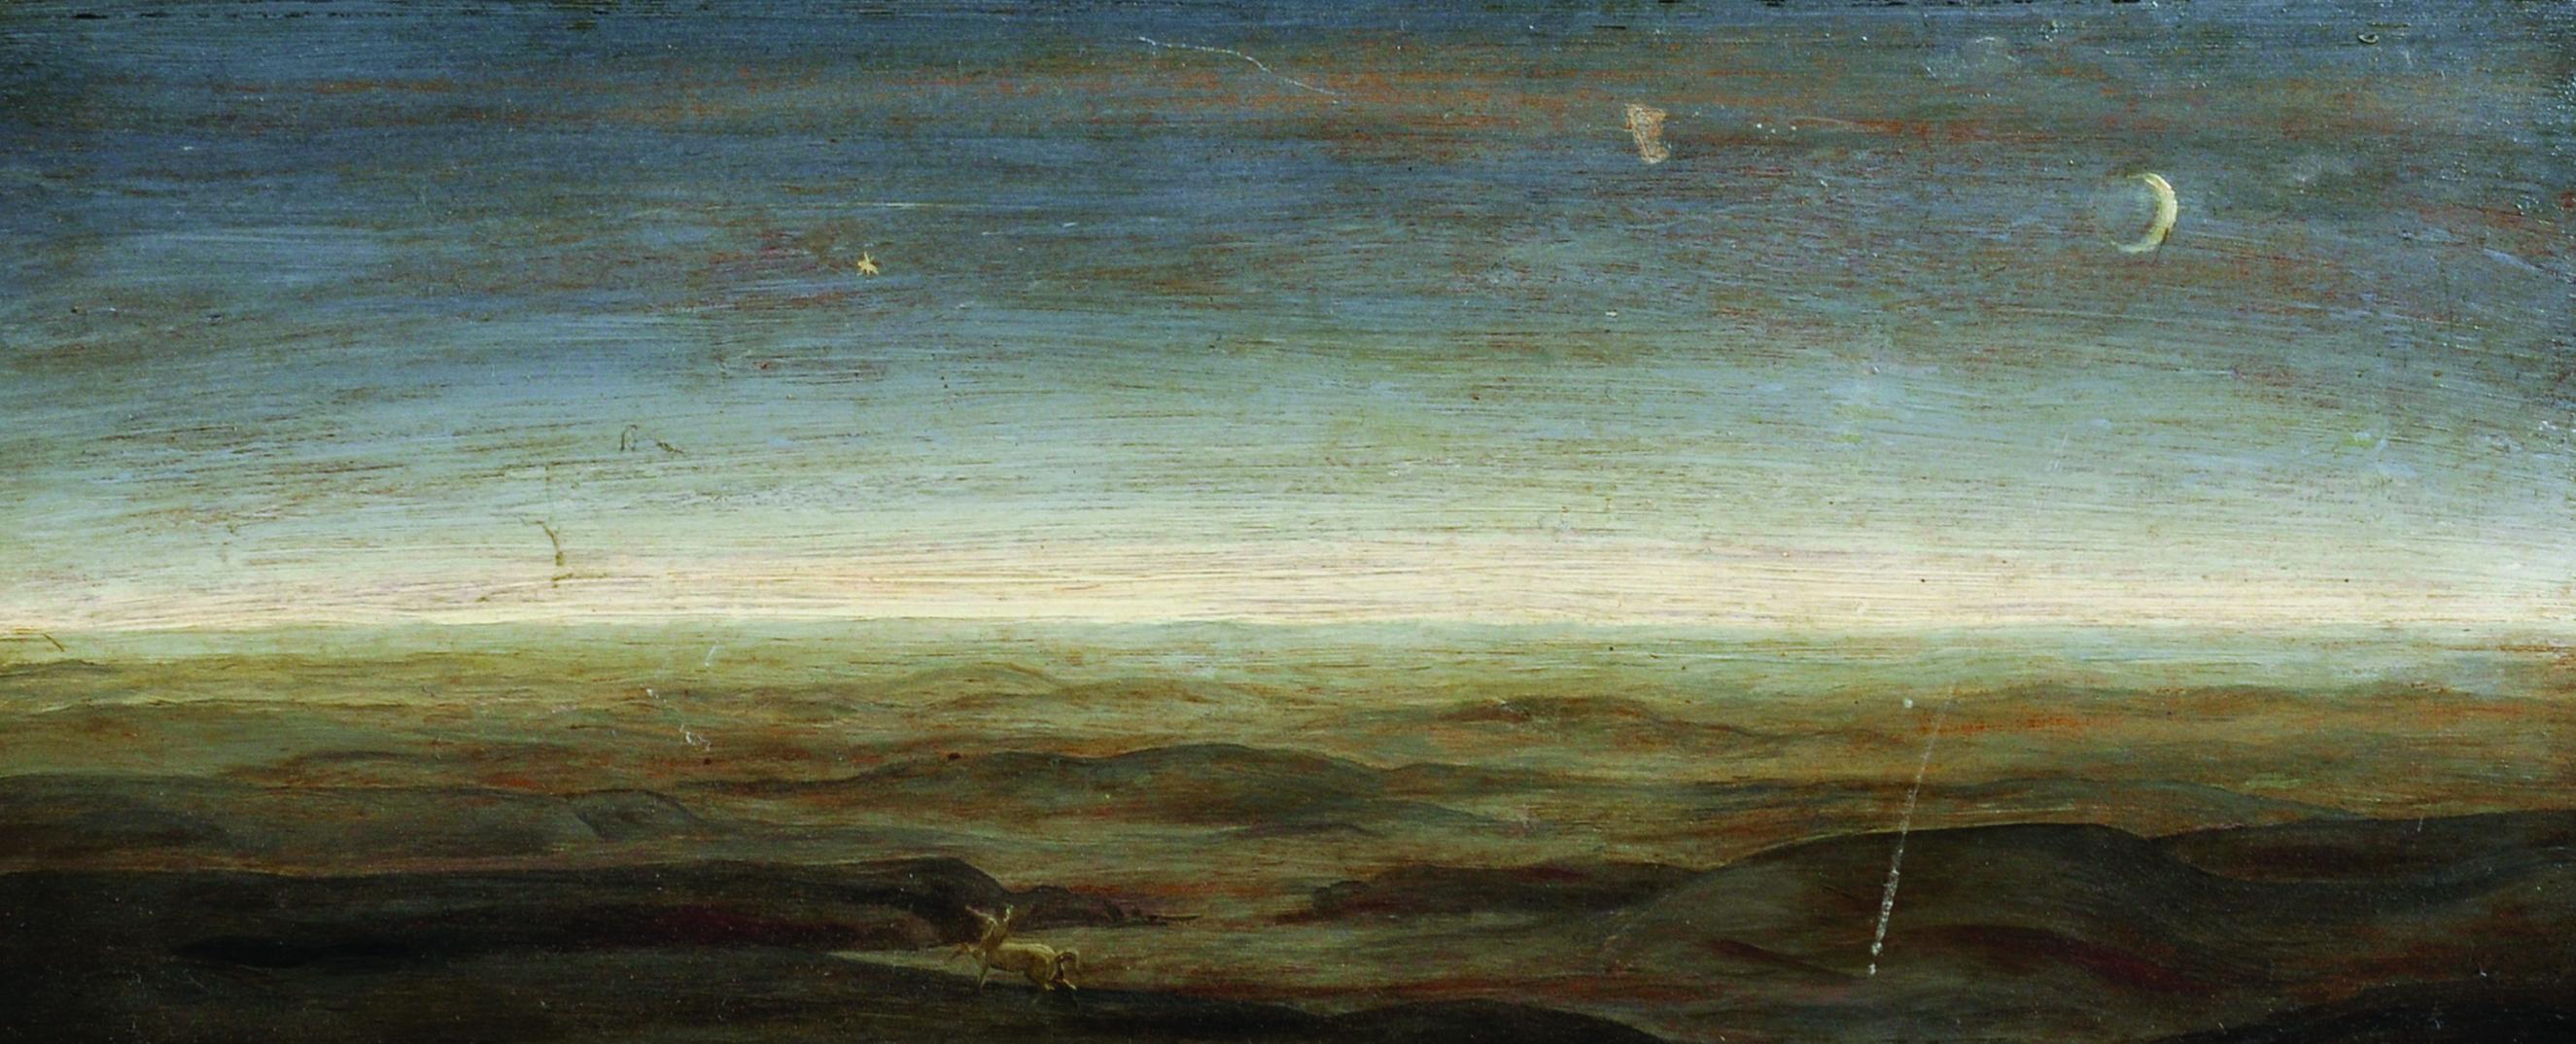 William Blake Richmond (1842-1921) British./Valuers and Auctioneers